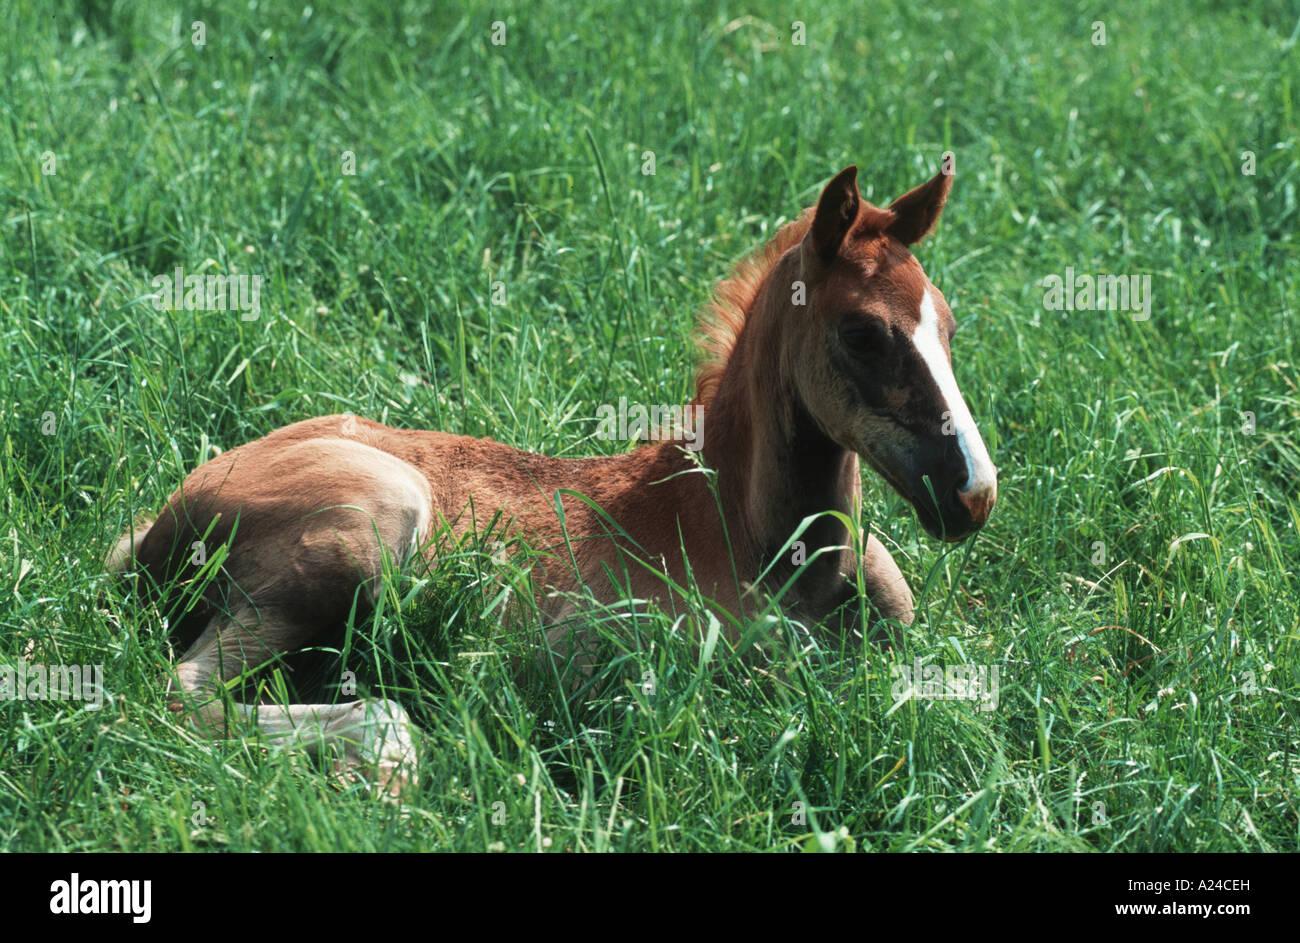 Warmblutpferd Warmblooded Horse - Stock Image